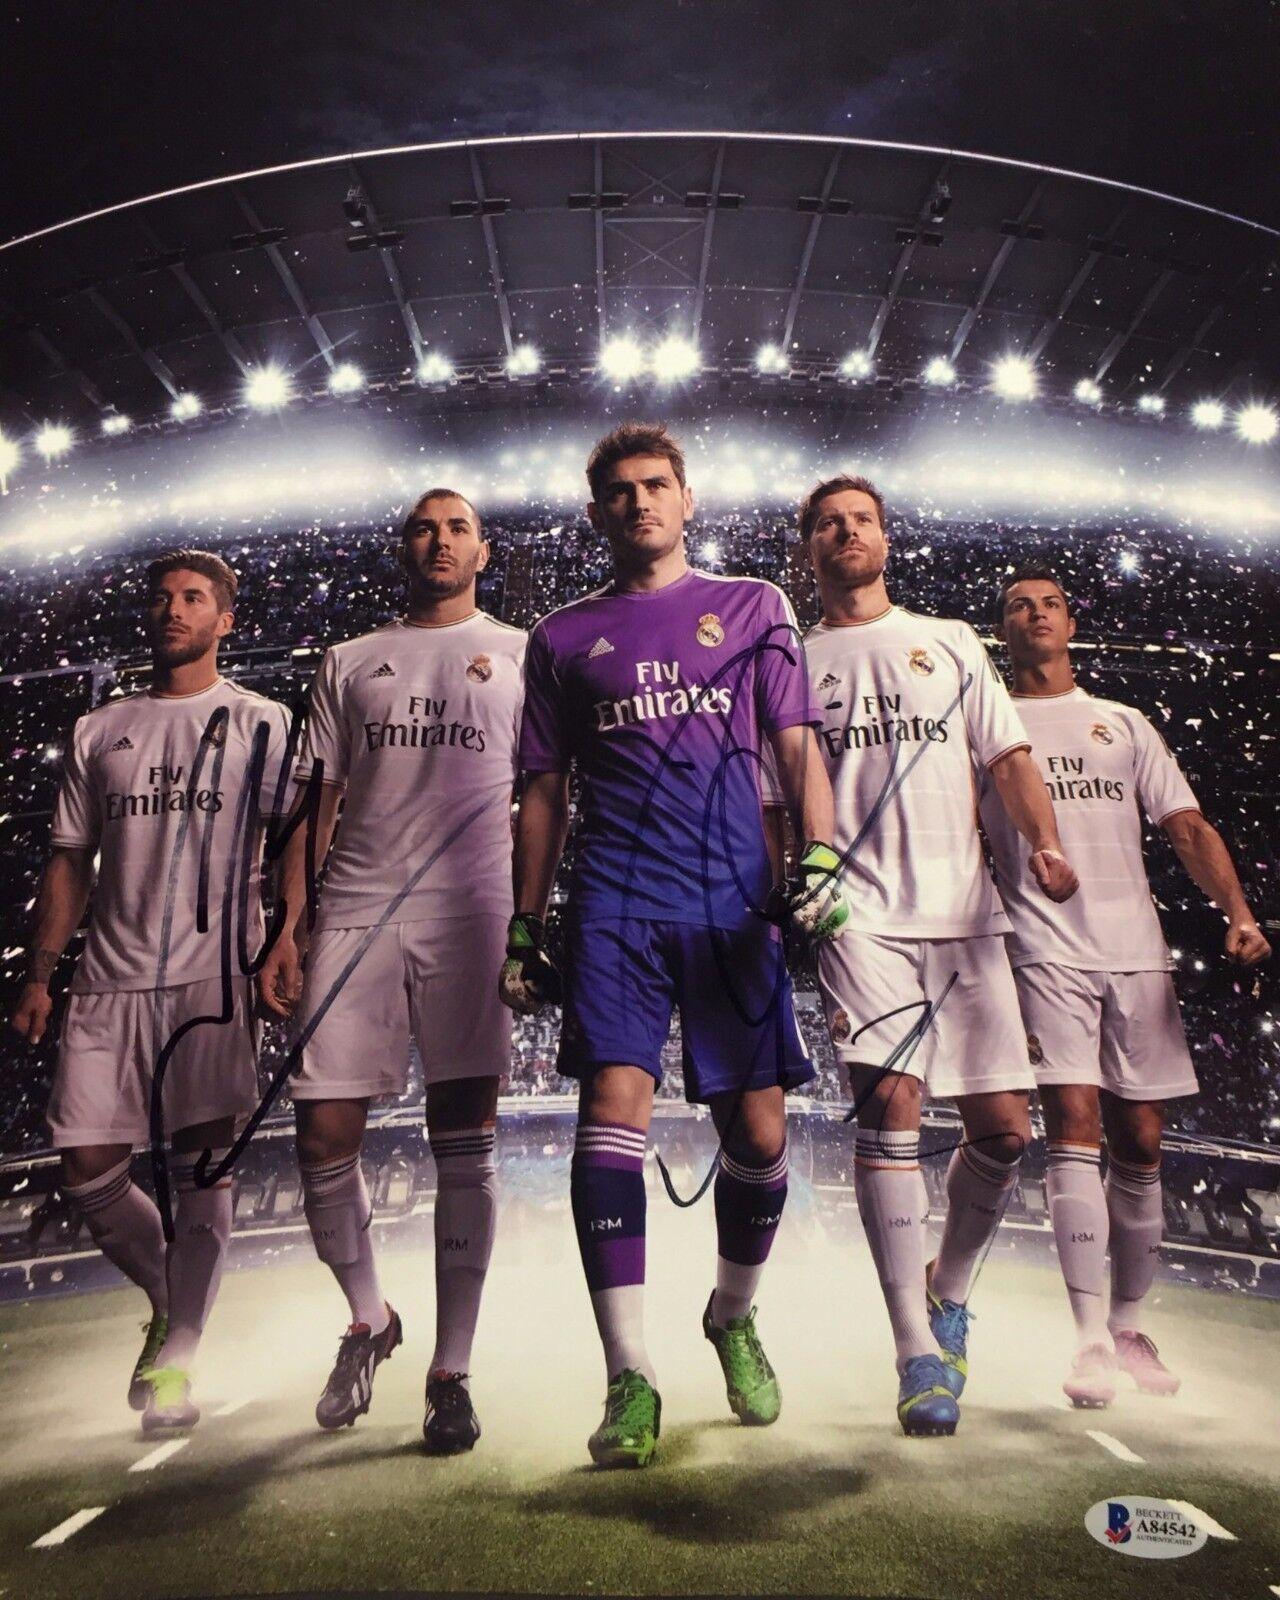 Sergio Ramos/Iker Casillas/Mesut Ozil Signed 11x14 Soccer Photo BAS Beckett 4542